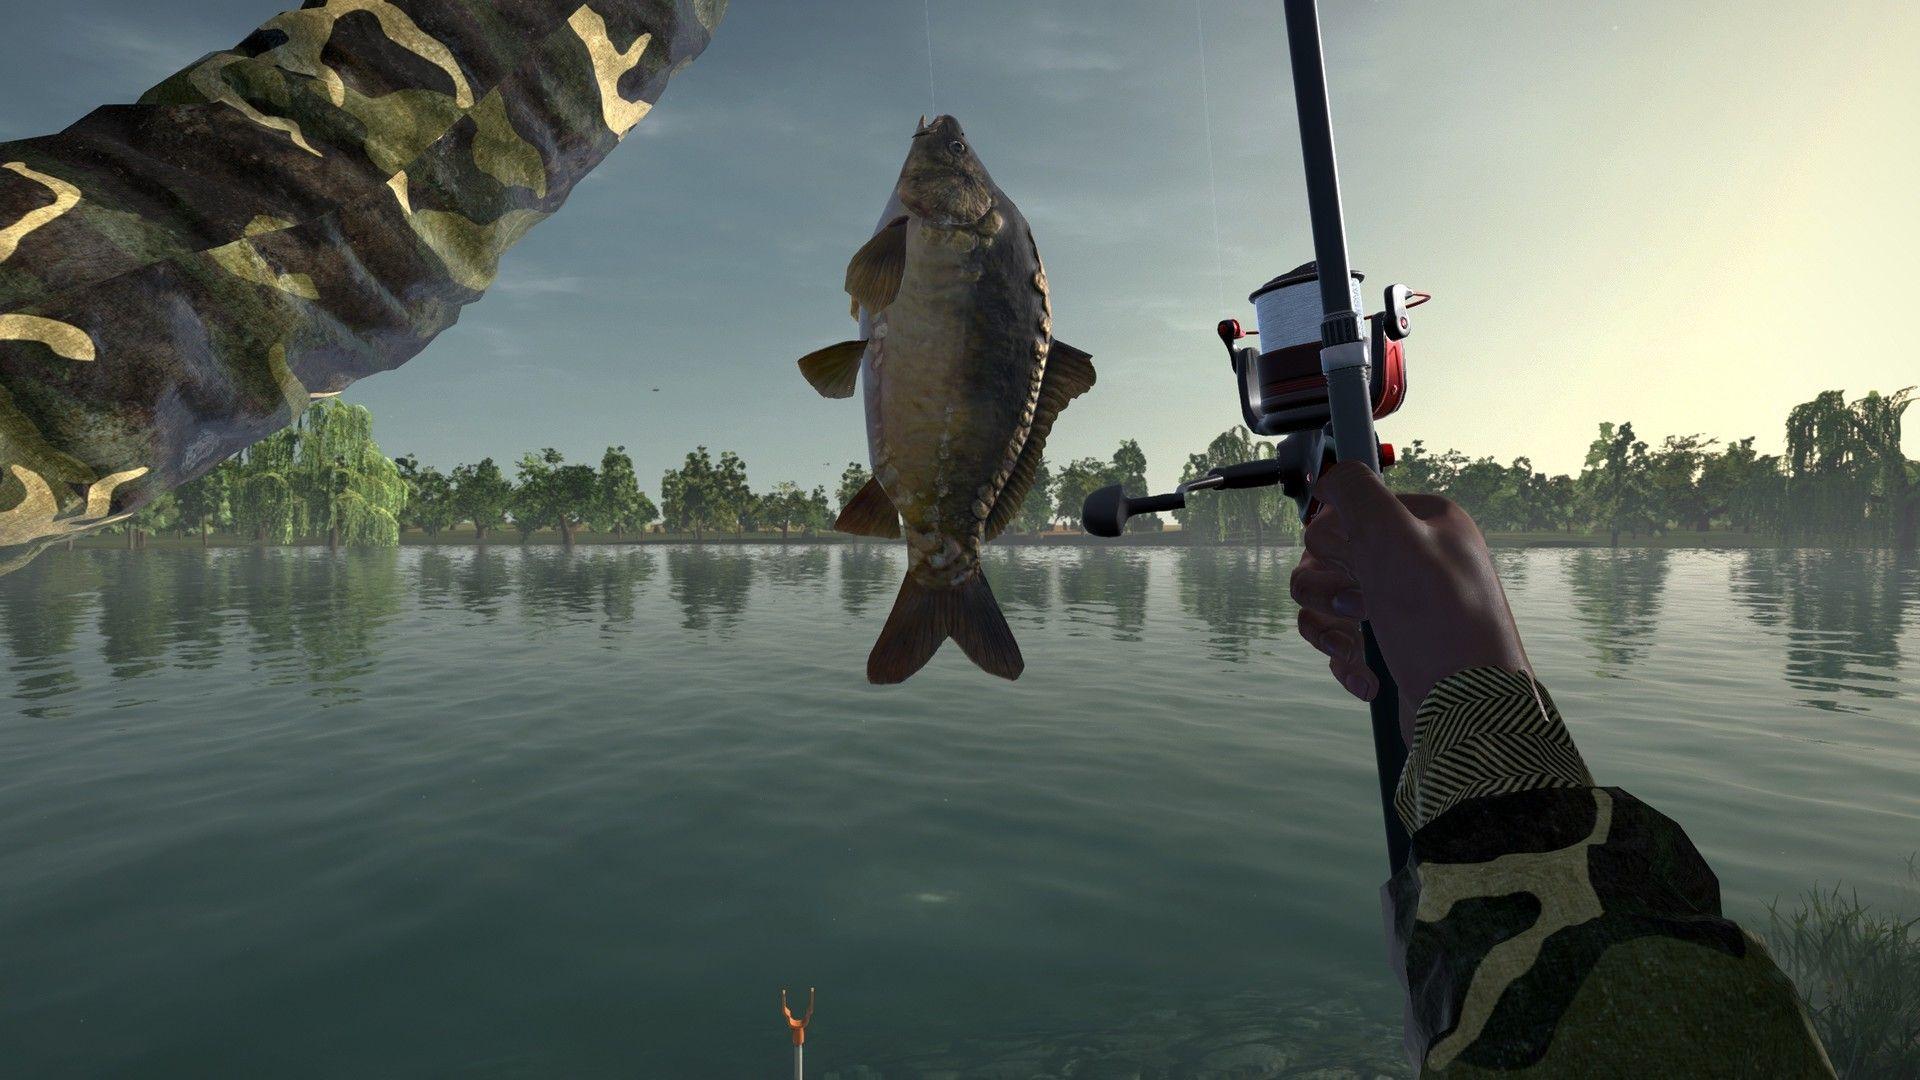 Pin by Niche Gamer on Niche Gamer Moraine lake, Fish